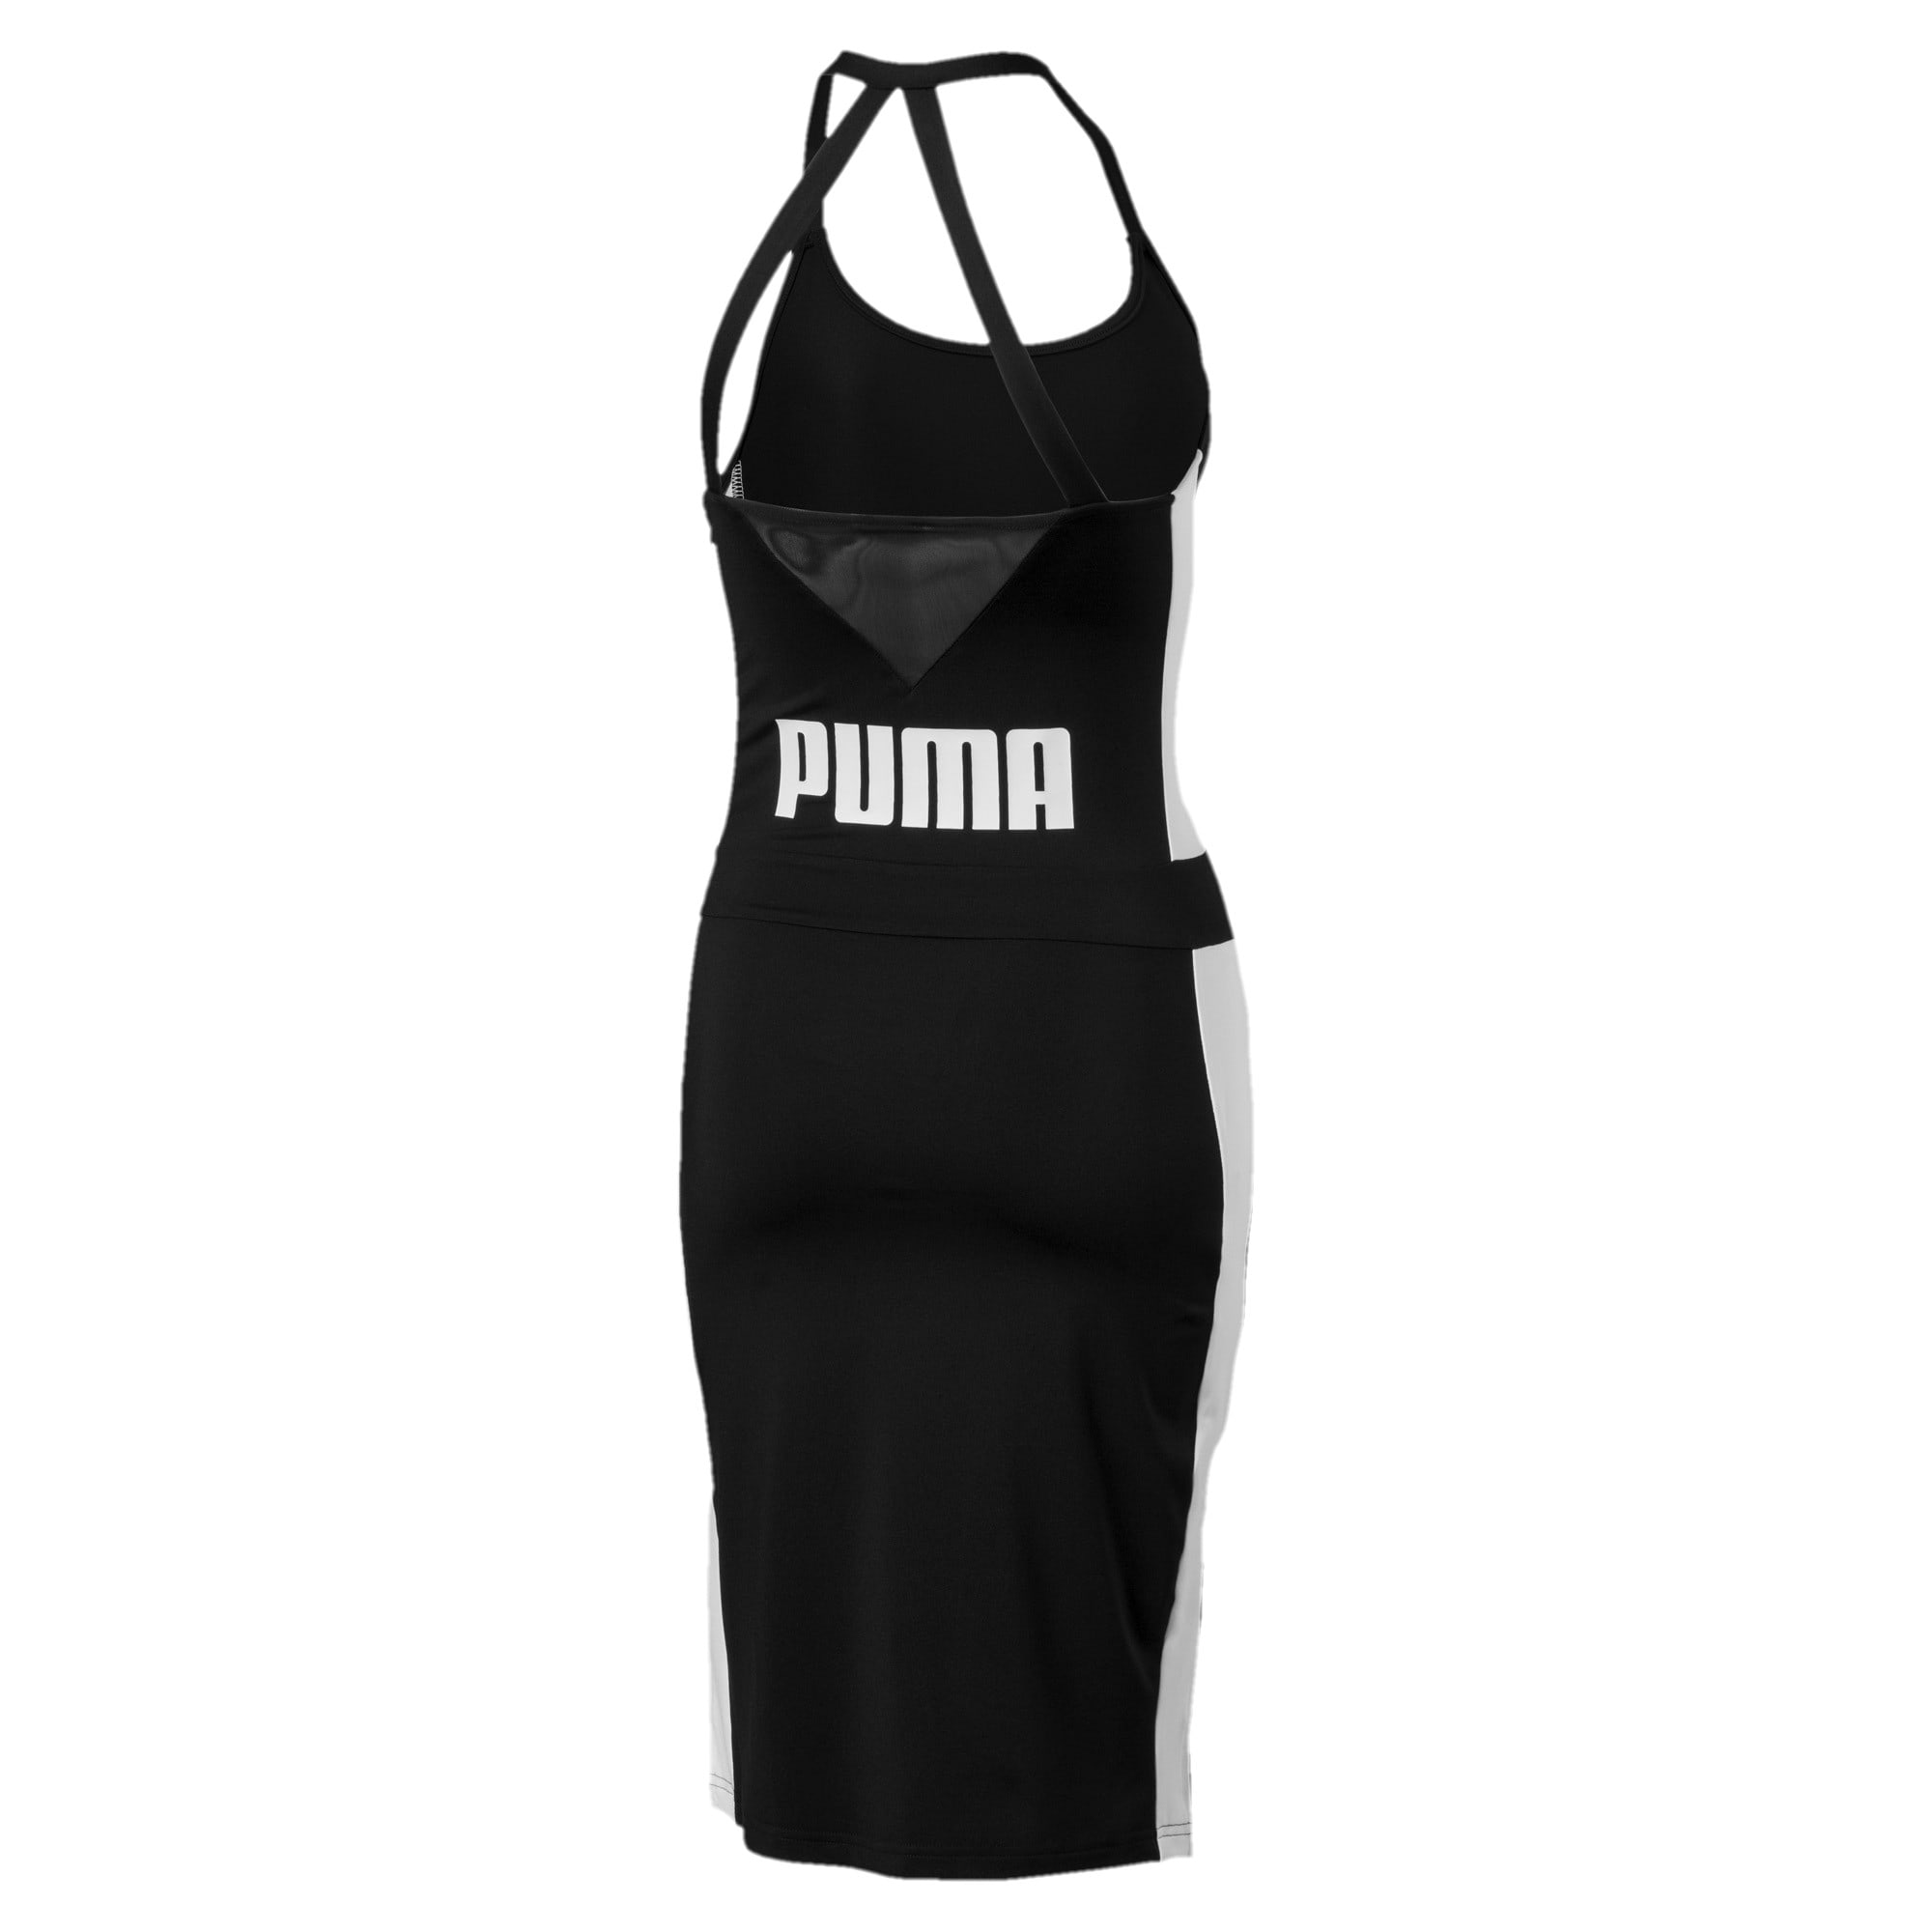 Thumbnail 2 of Archive T7 Women's Dress, Puma Black, medium-IND